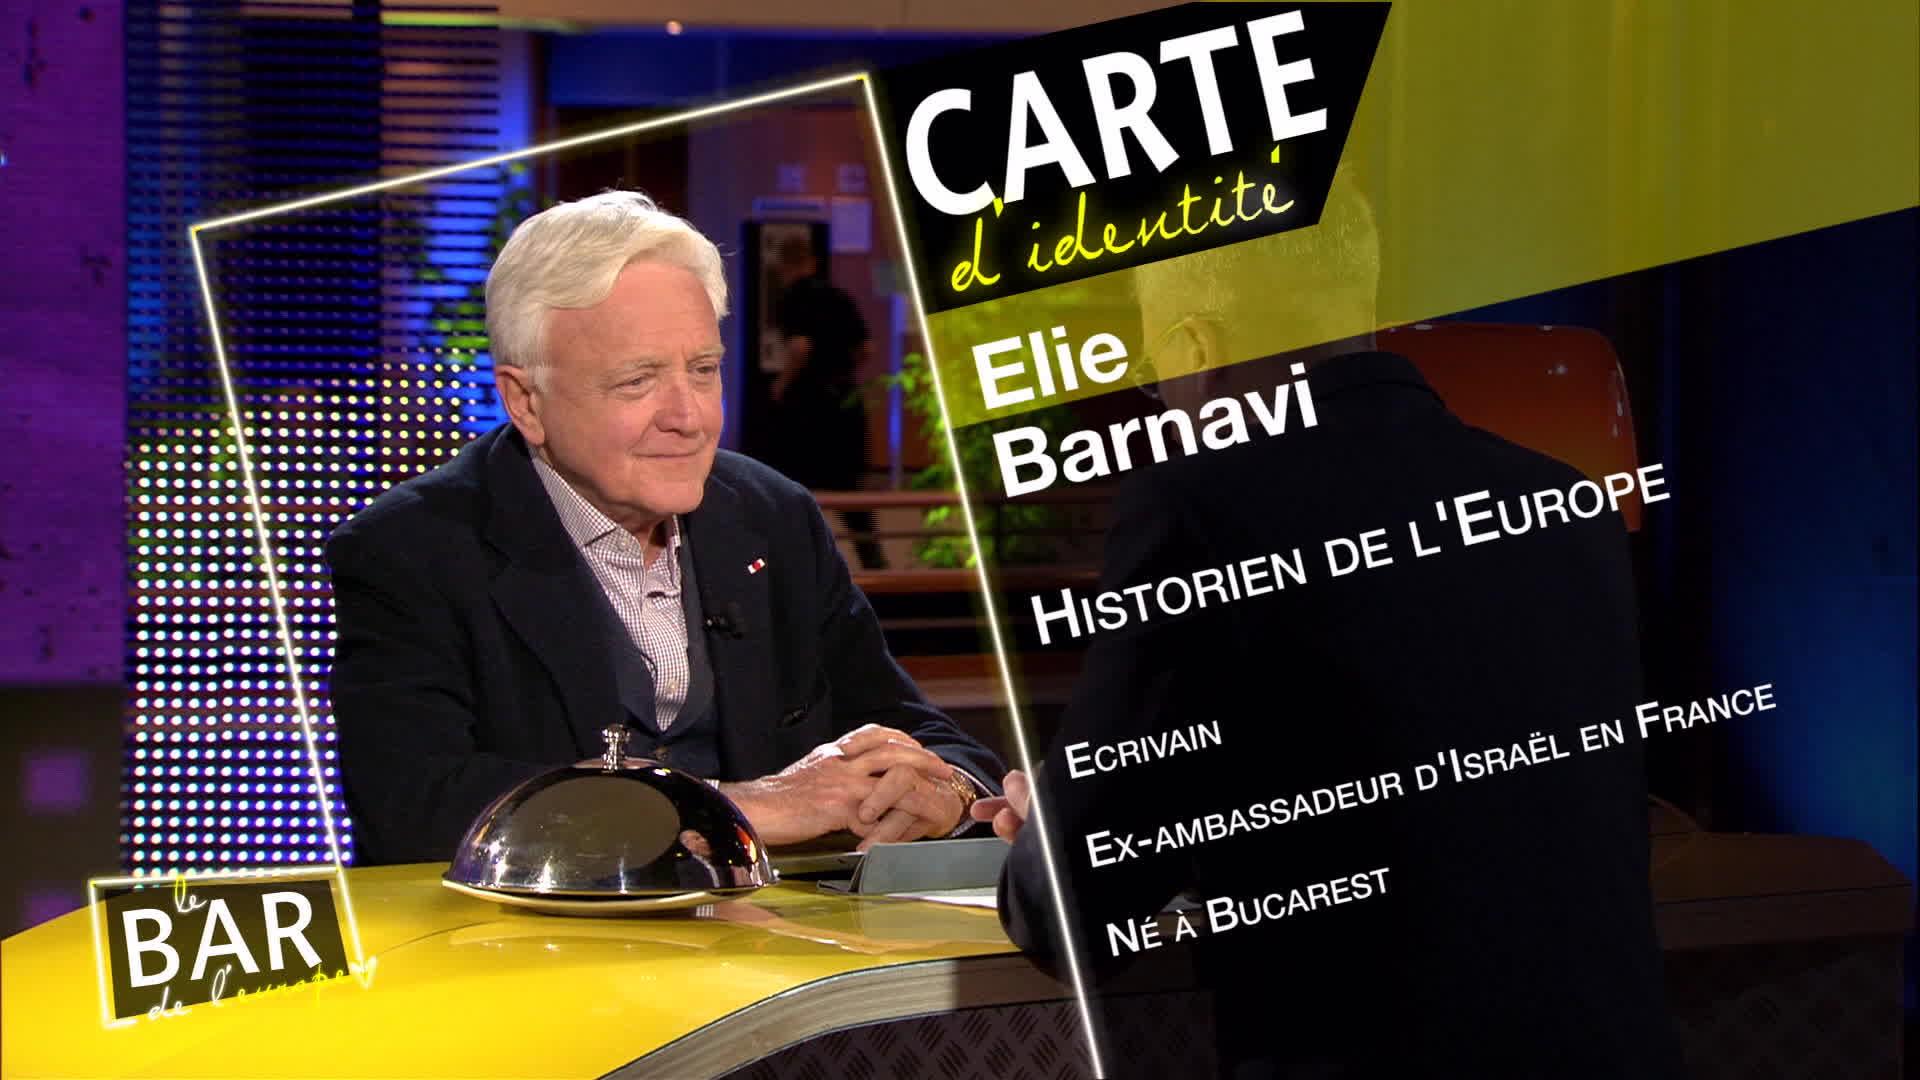 Élie Barnavi